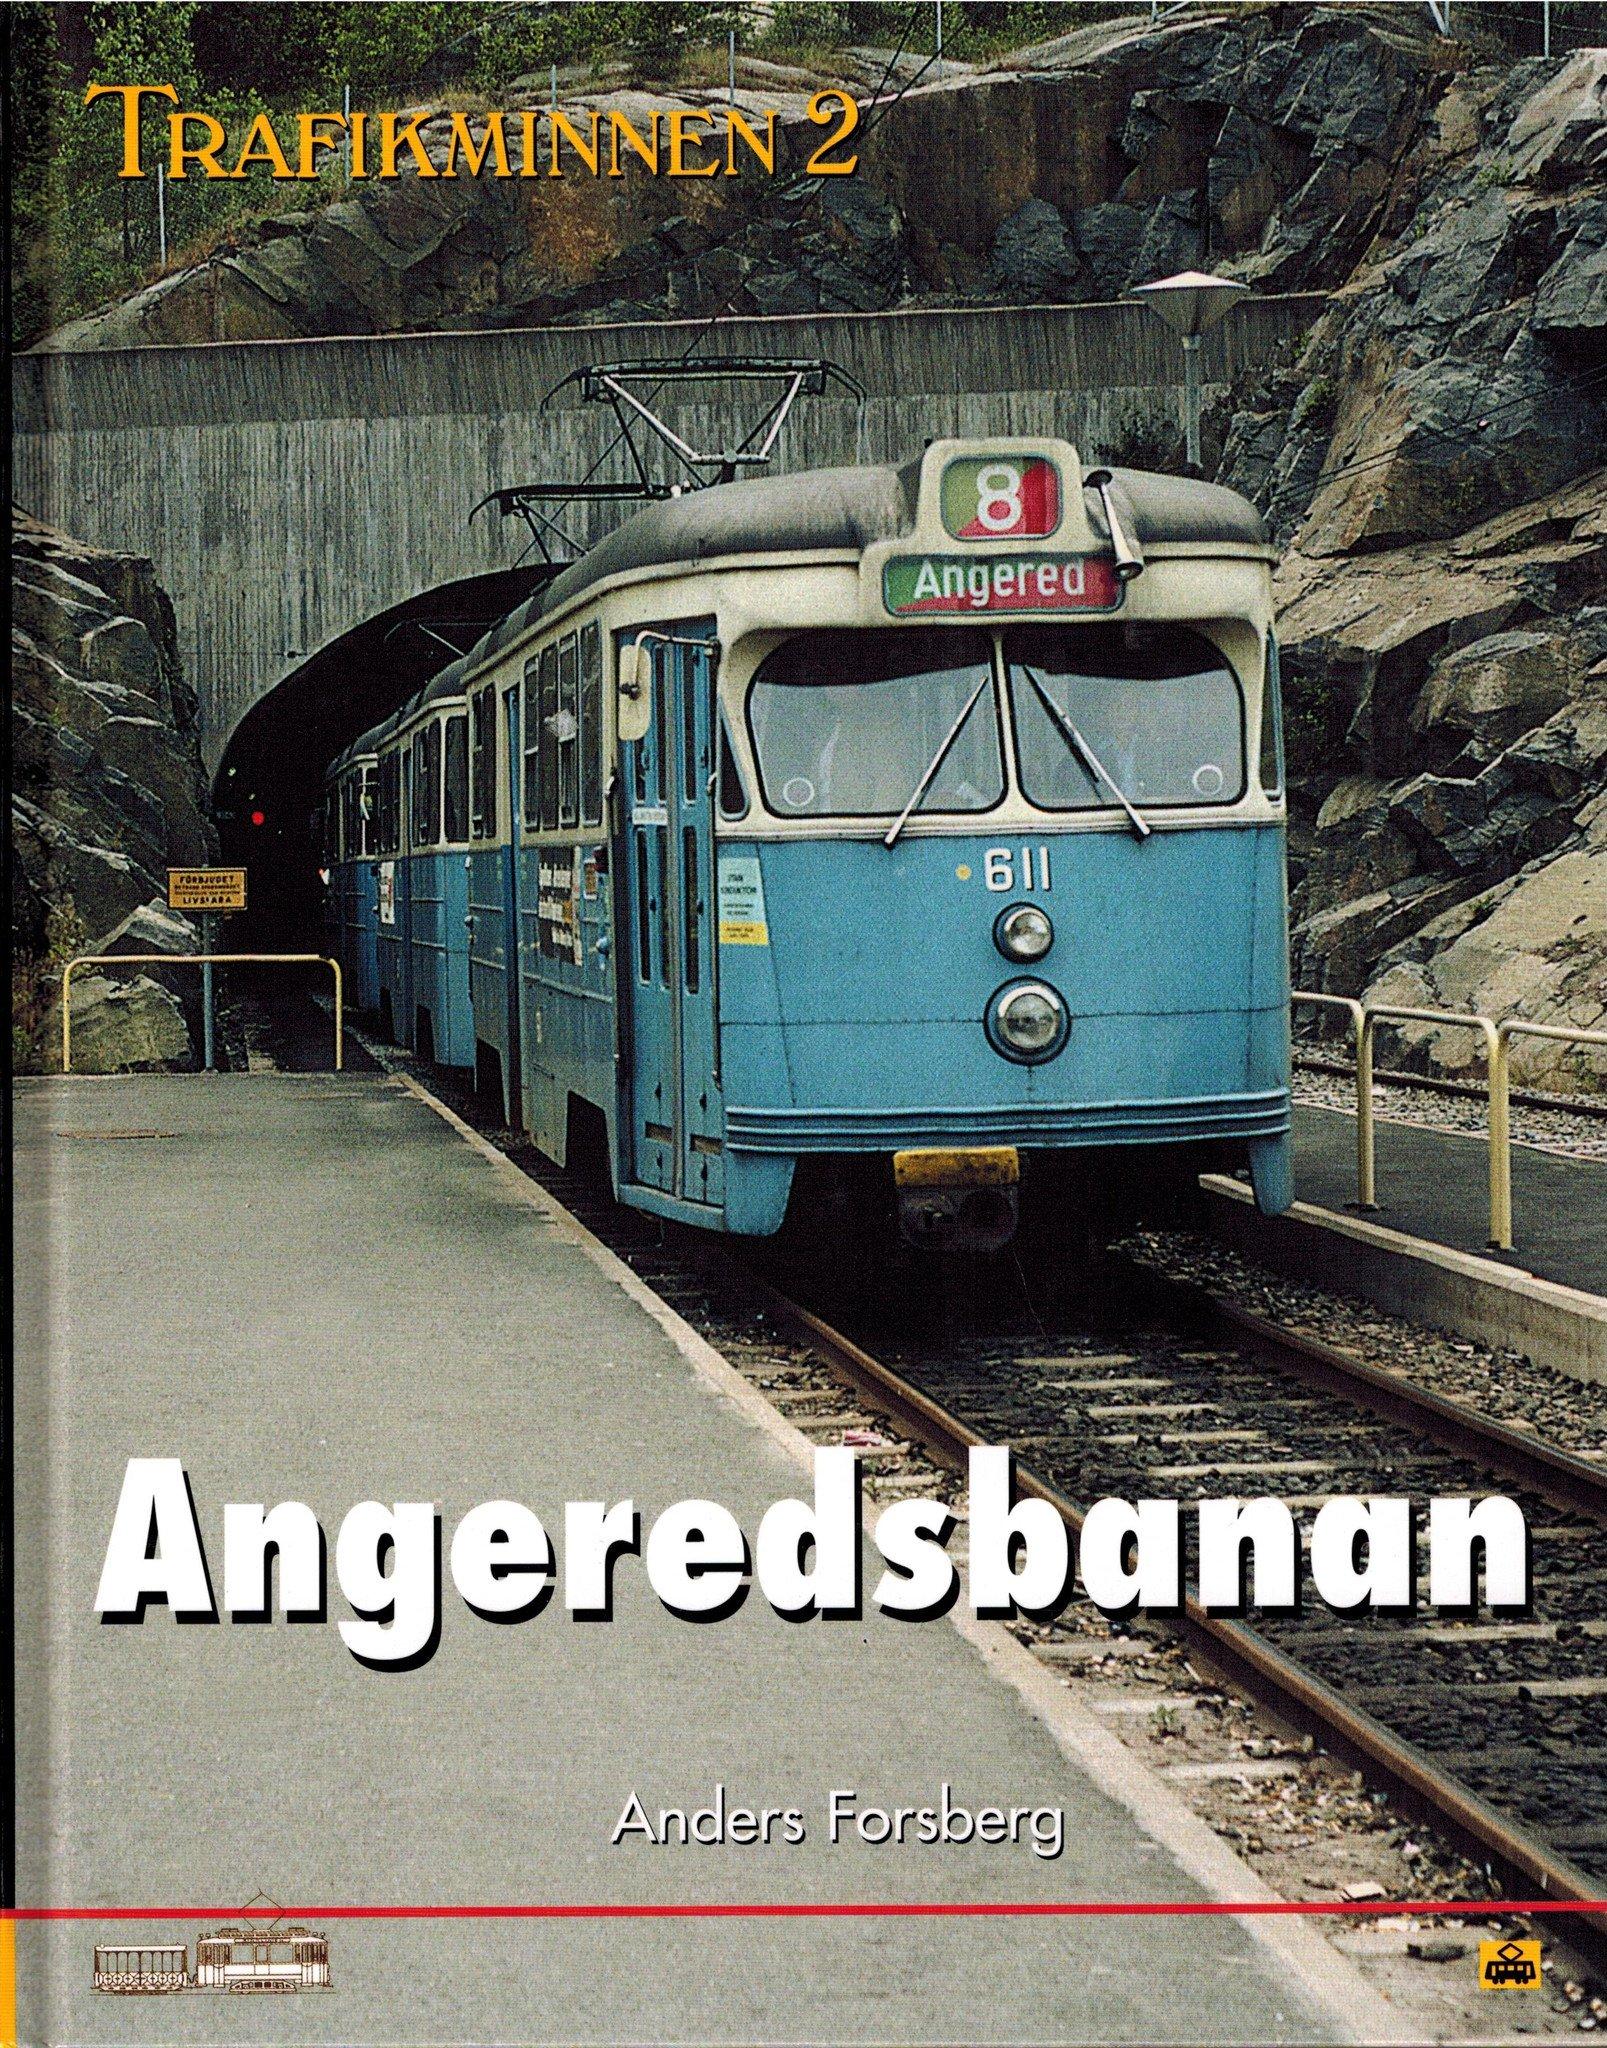 Trafikminnen 2: Angeredsbanan